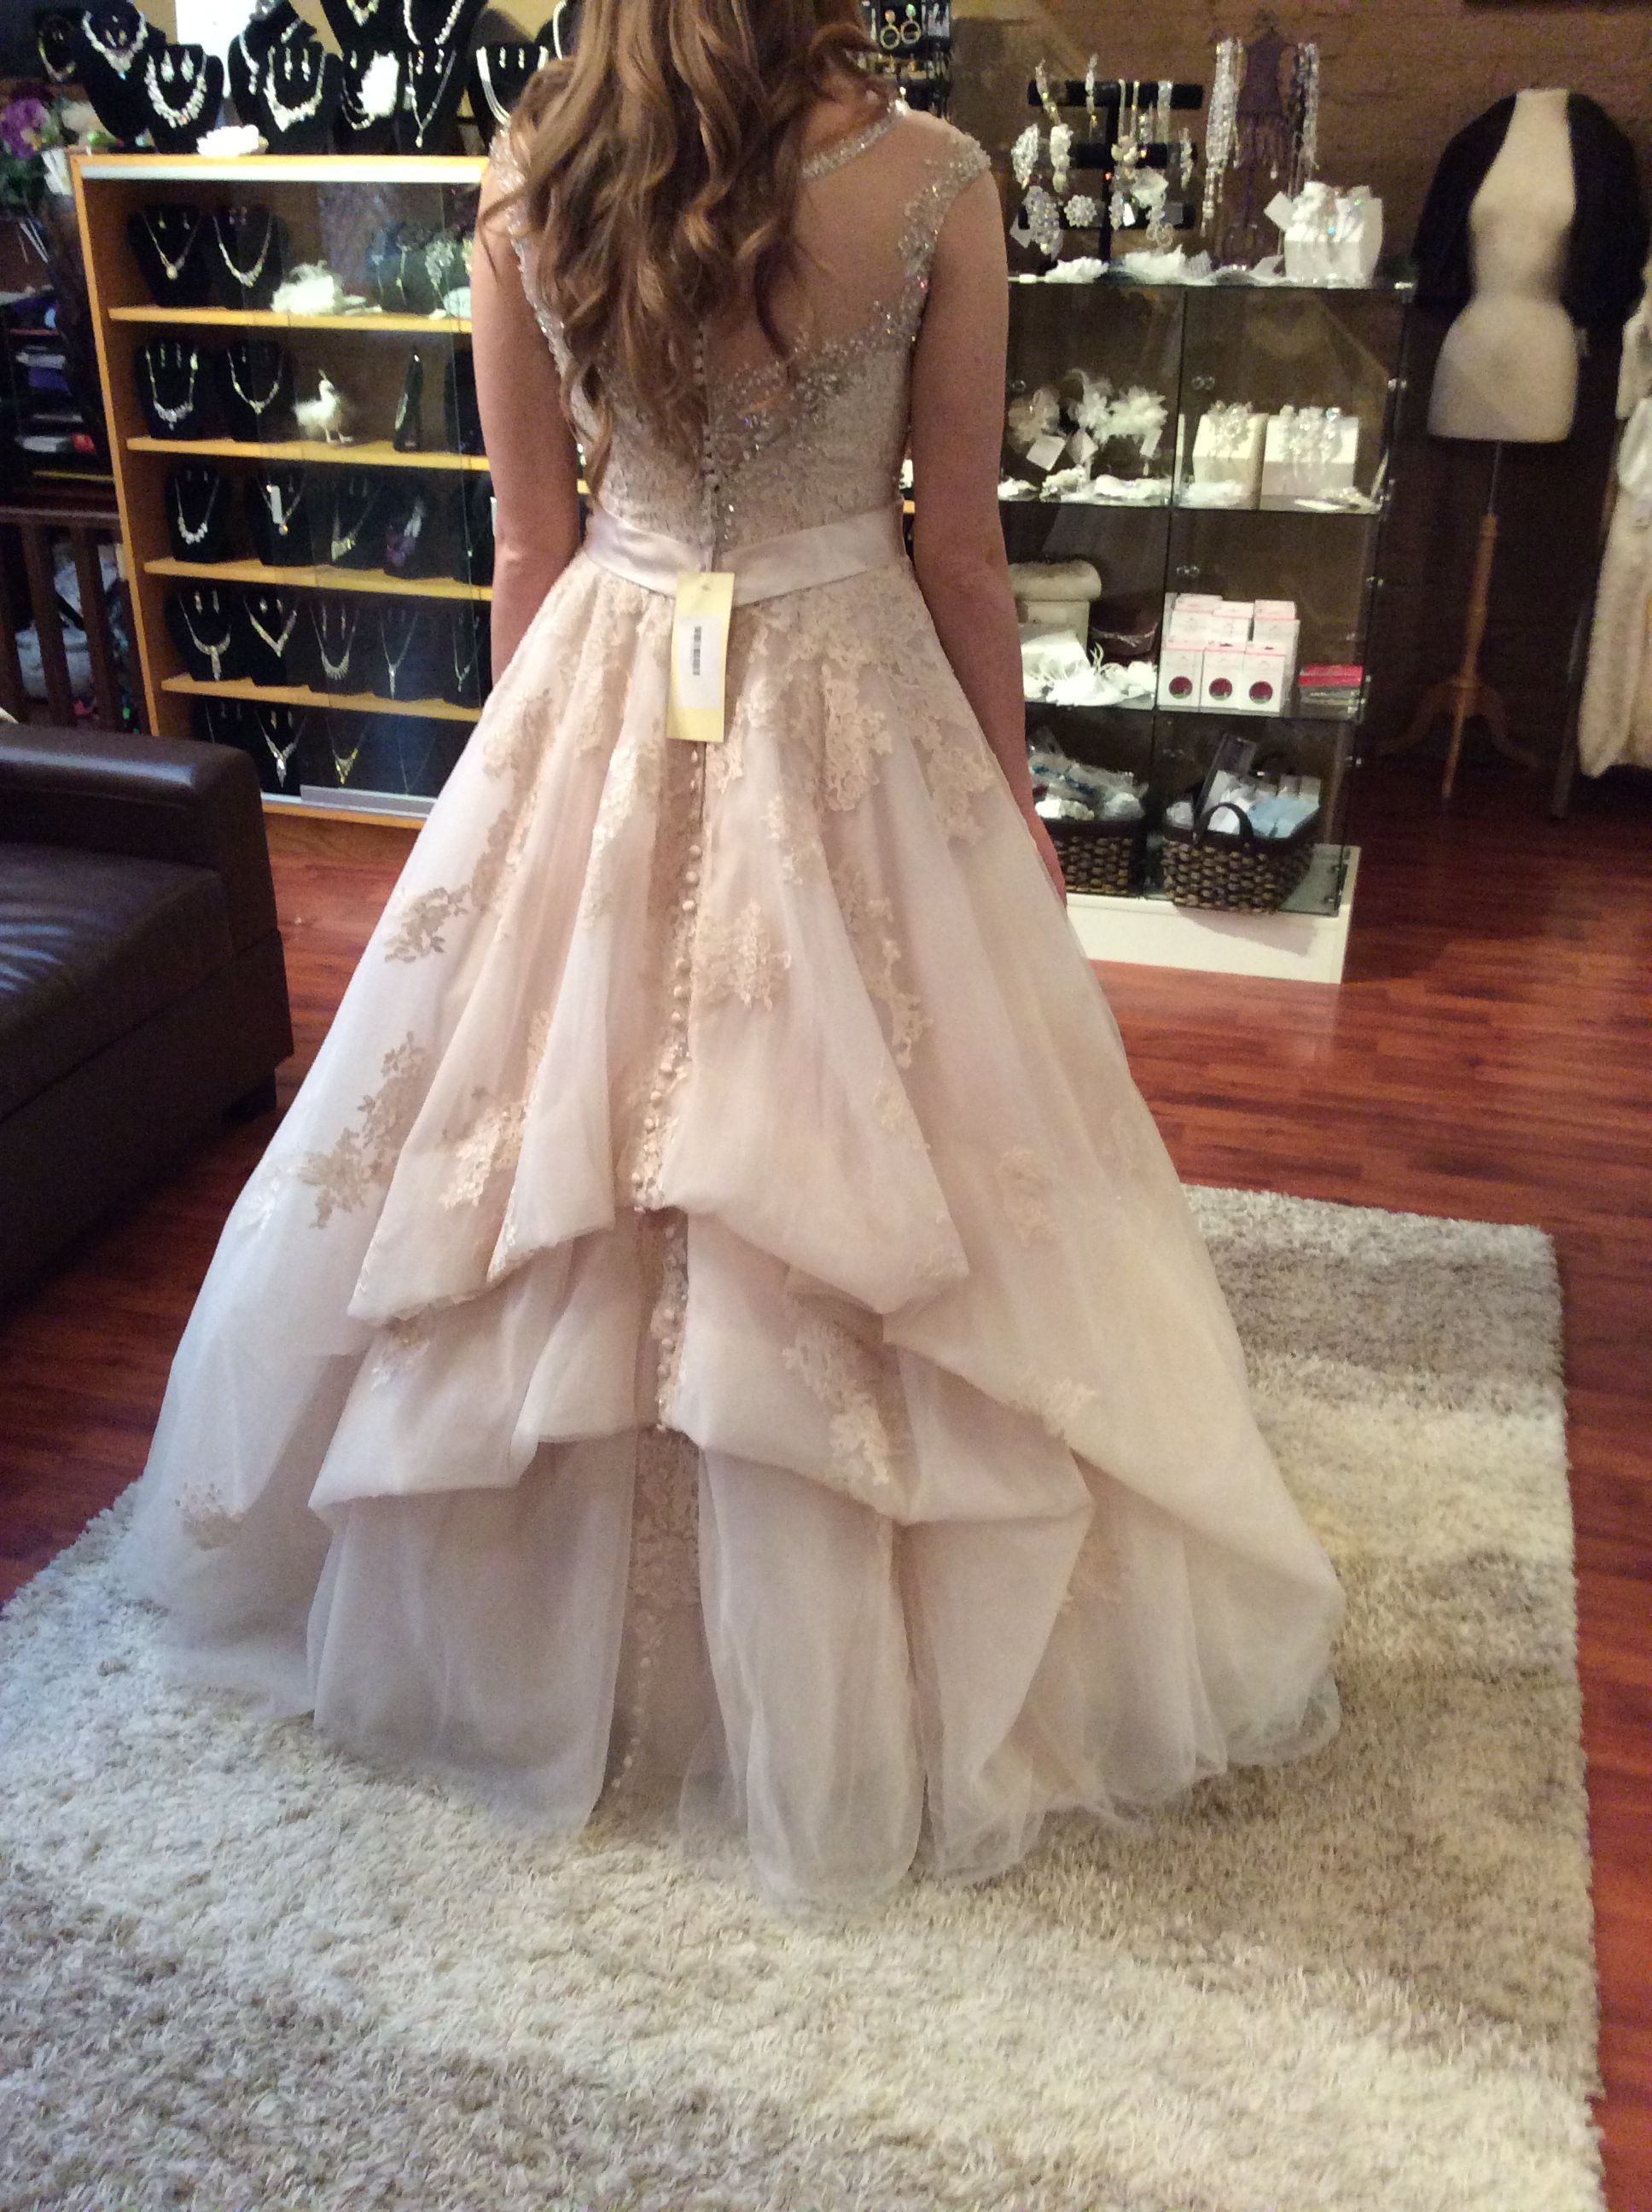 Bustle Wedding Dress Google Search Wedding Dress Bustle Wedding Gown Bustle Wedding Dress Train Bustle